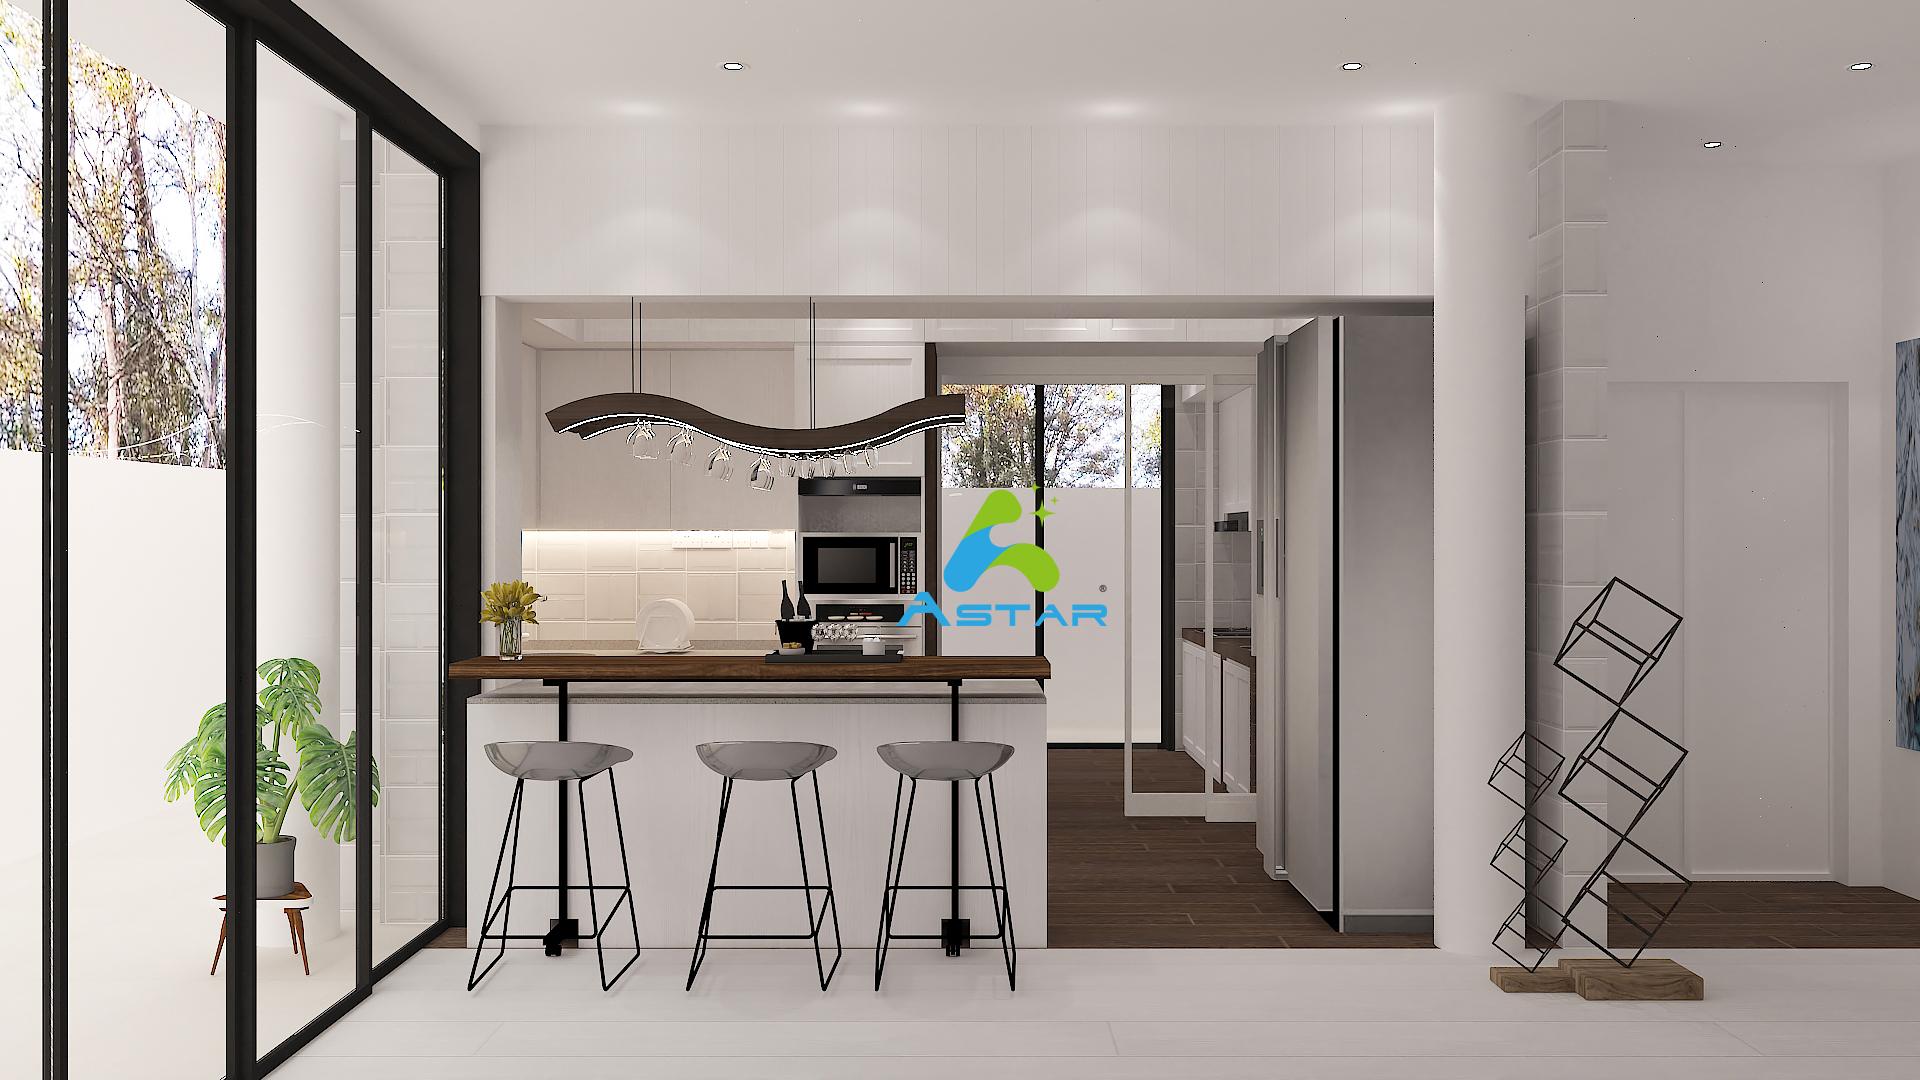 astar furnishing aluminum furniture projects Ettrick Terrace 2